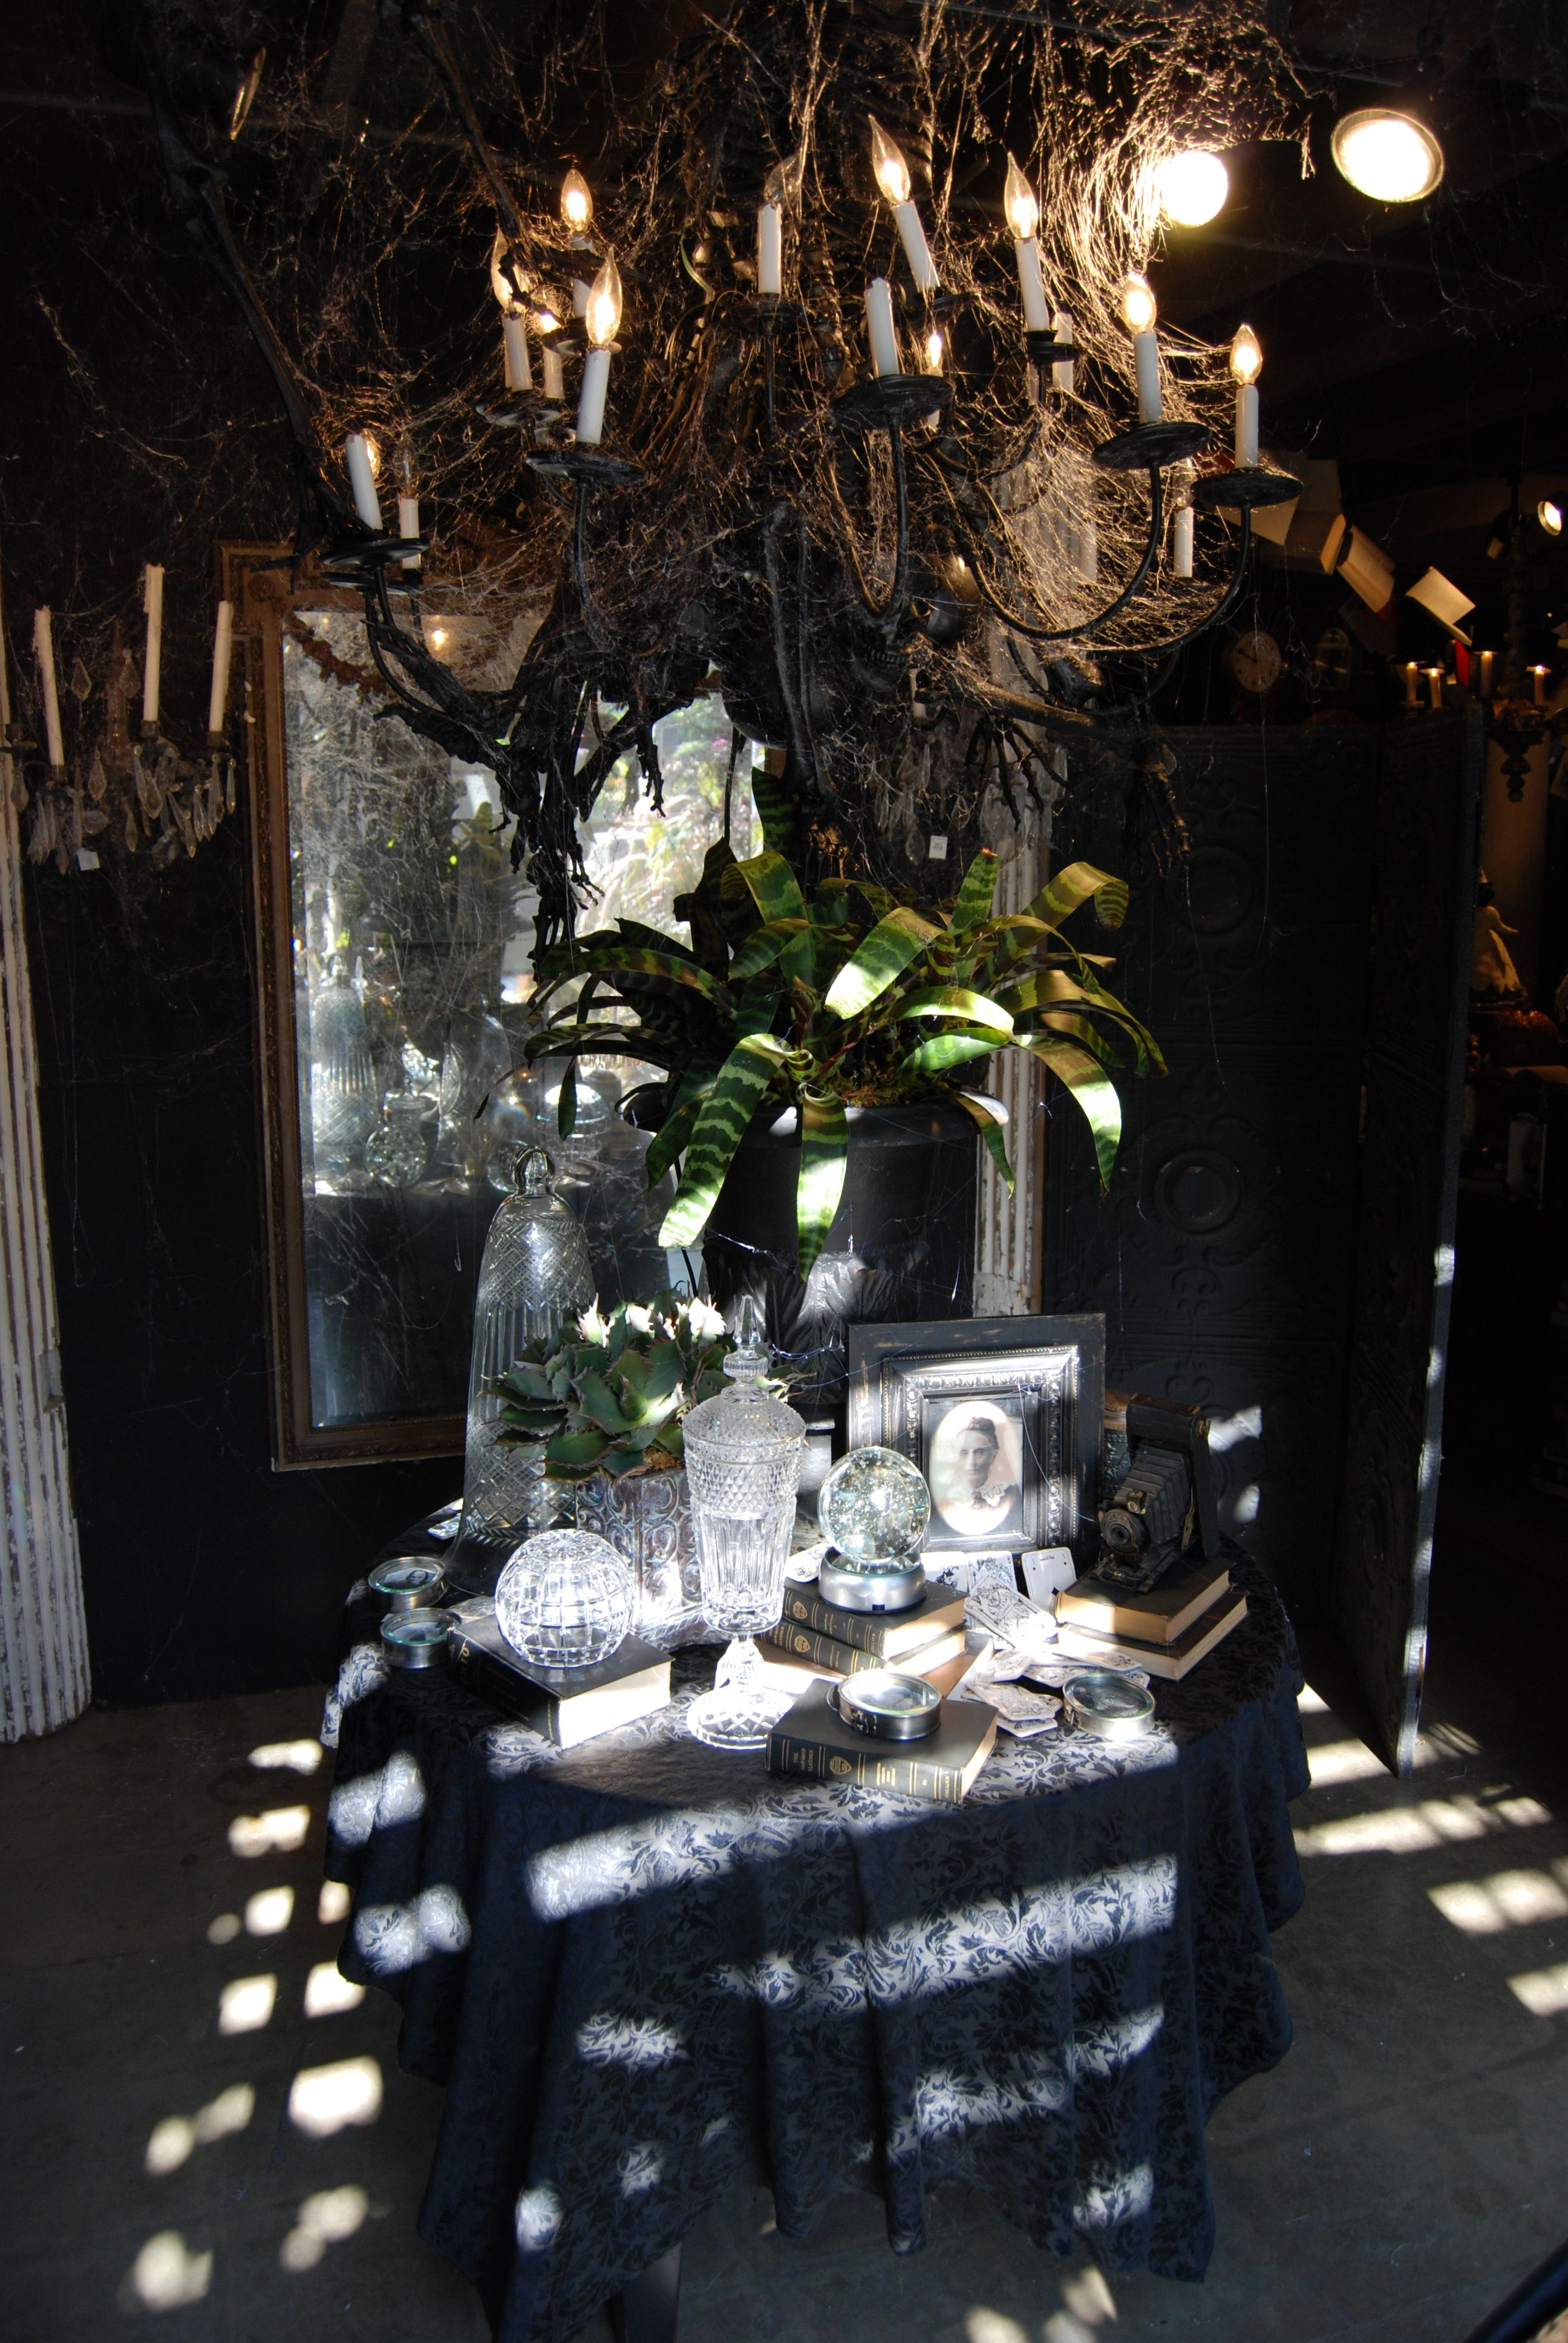 Halloween At Roger S Gardens Halloween Displays Halloween Decorations Indoor Rogers Gardens